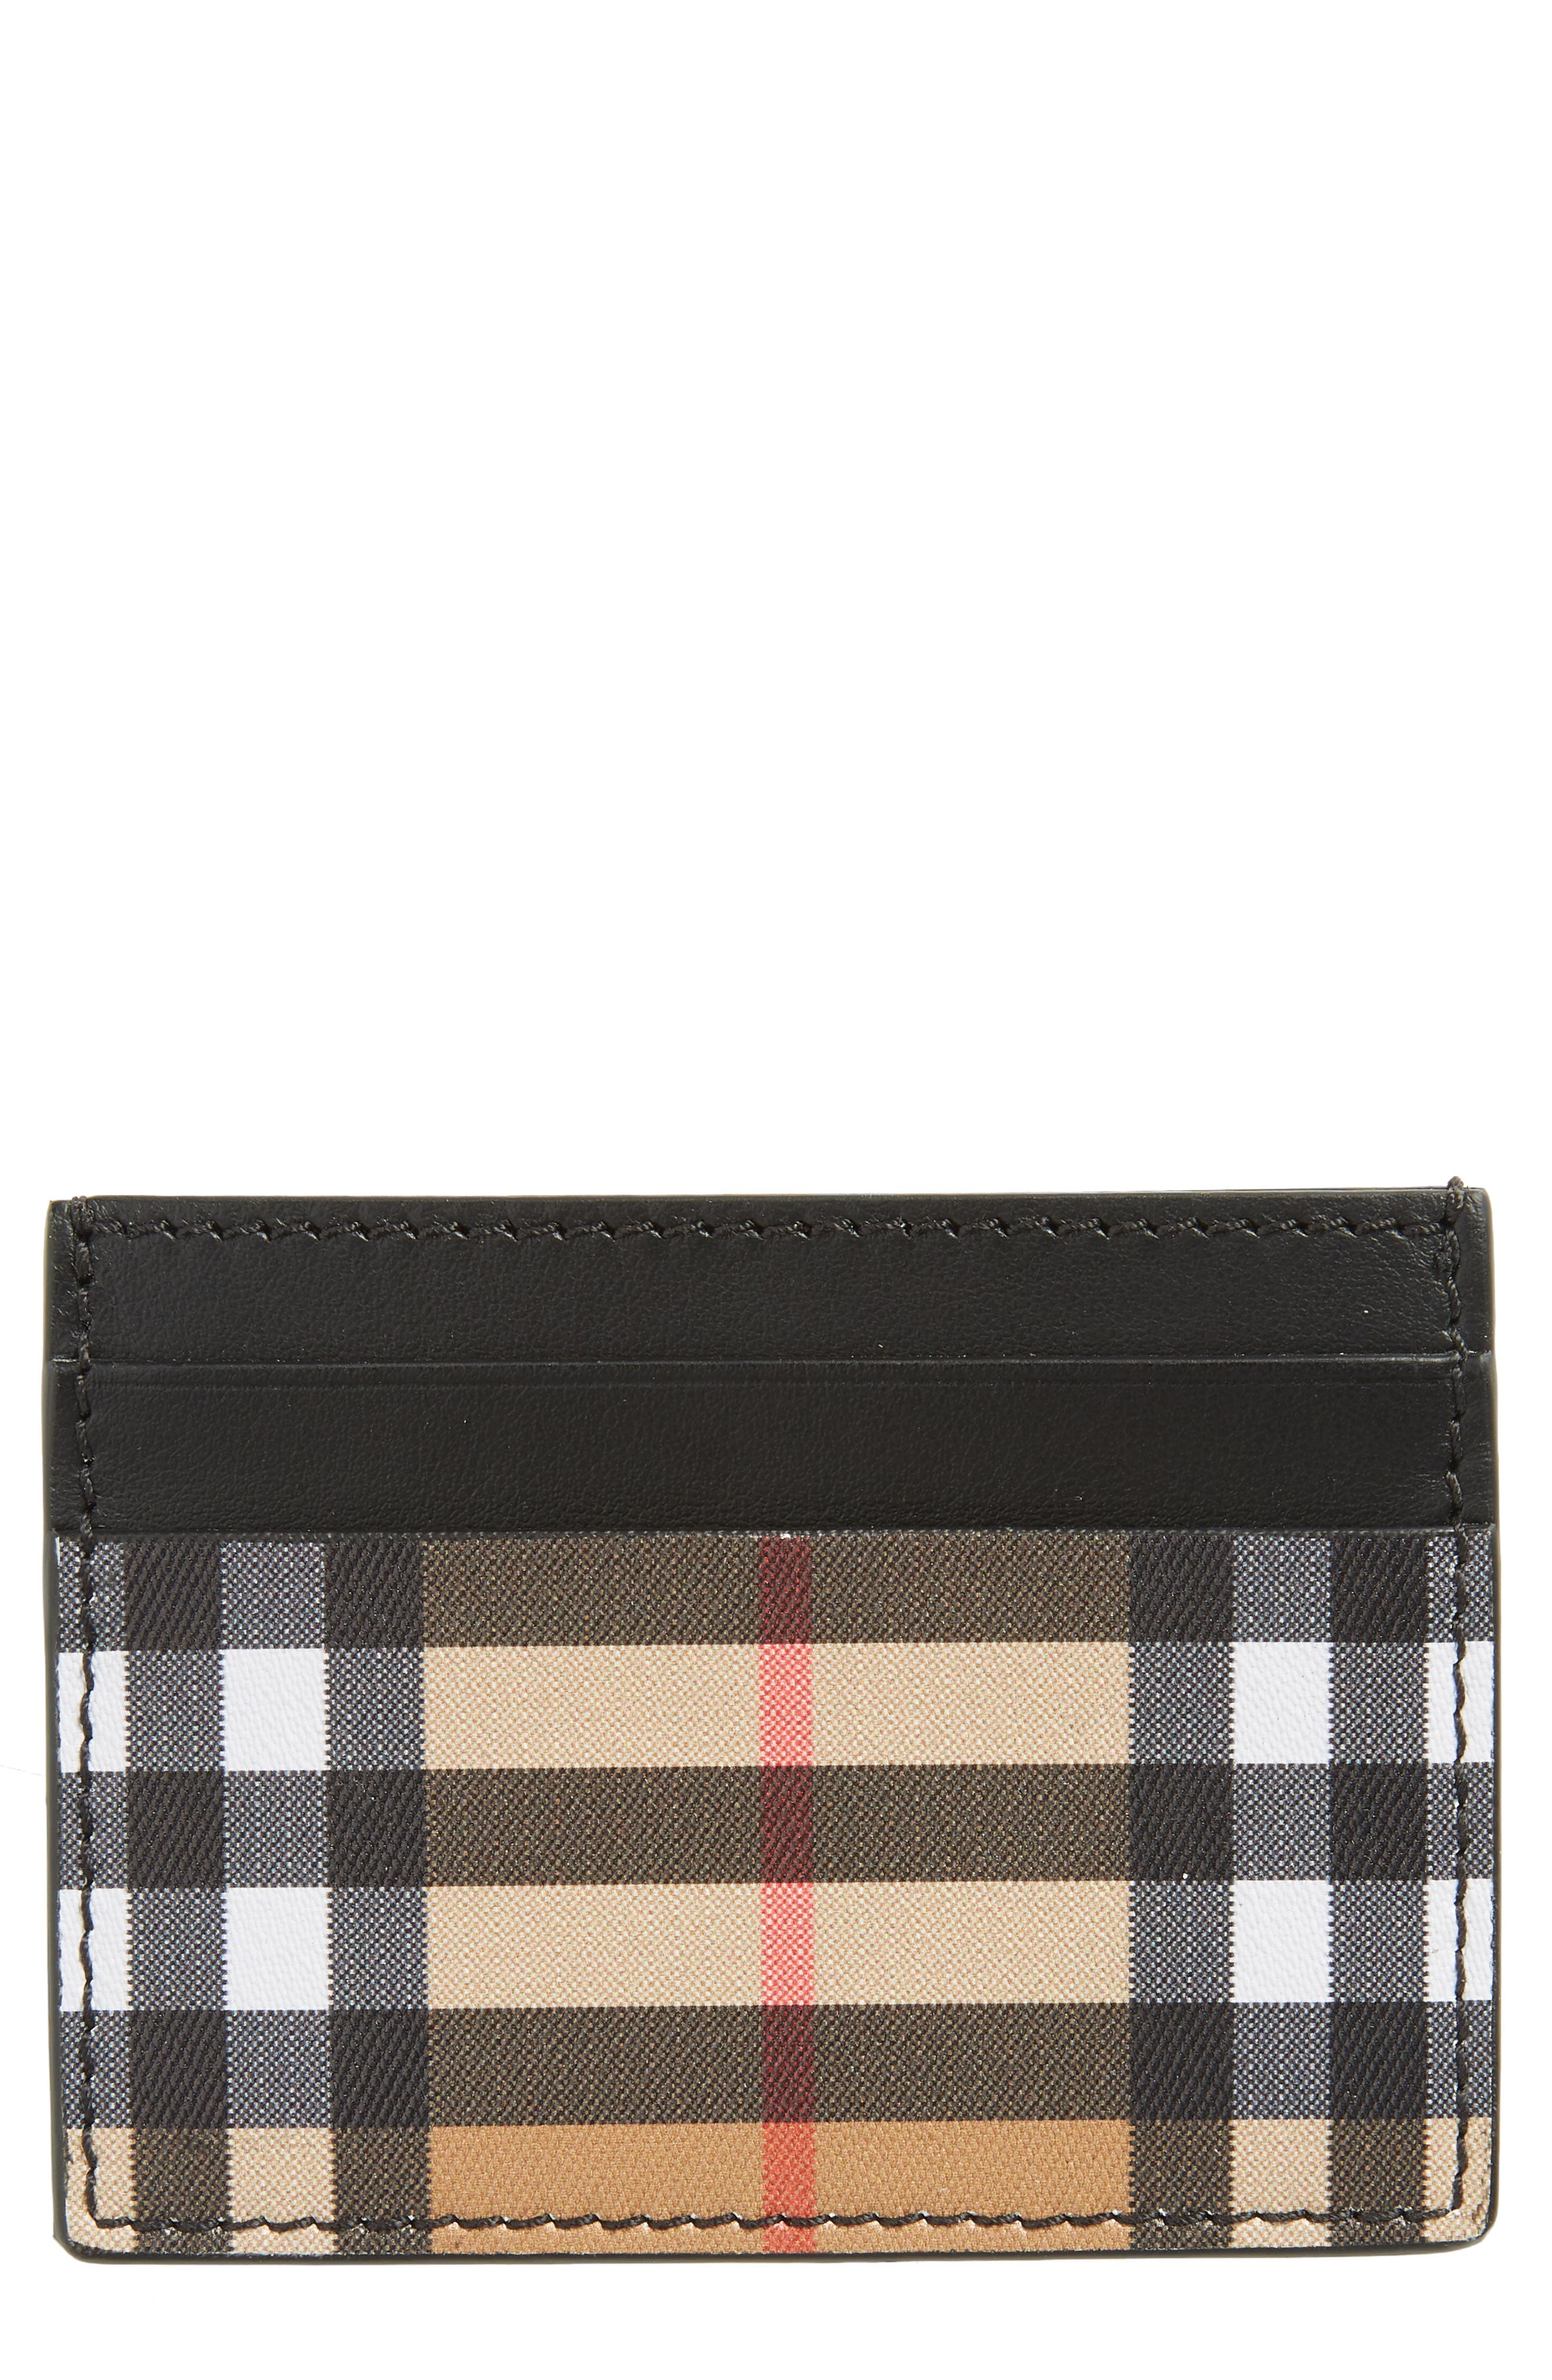 176f23da9b20 burberry wallet